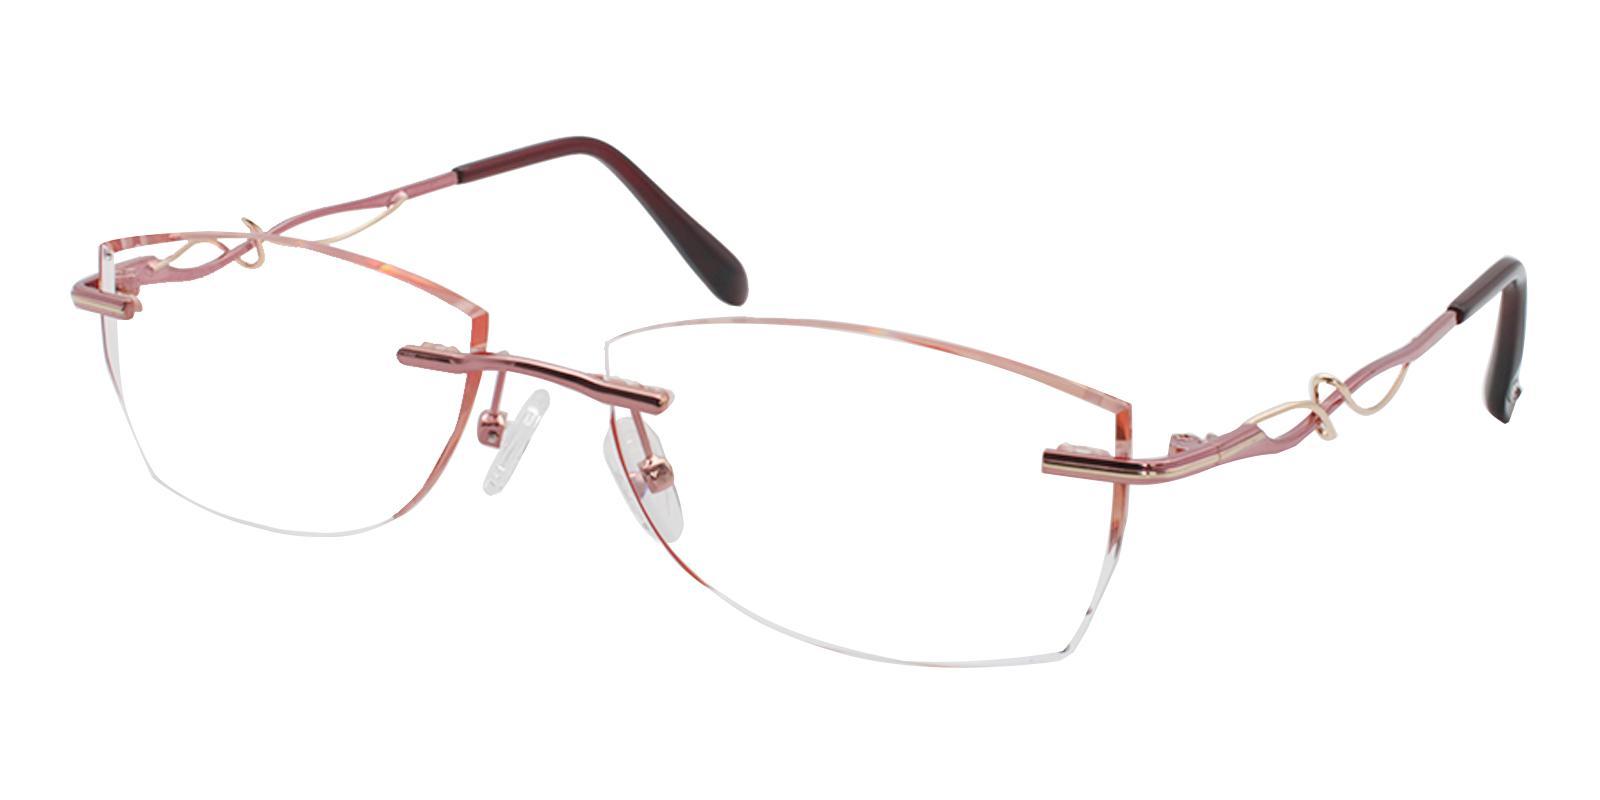 Sadie Red Titanium Eyeglasses , NosePads Frames from ABBE Glasses